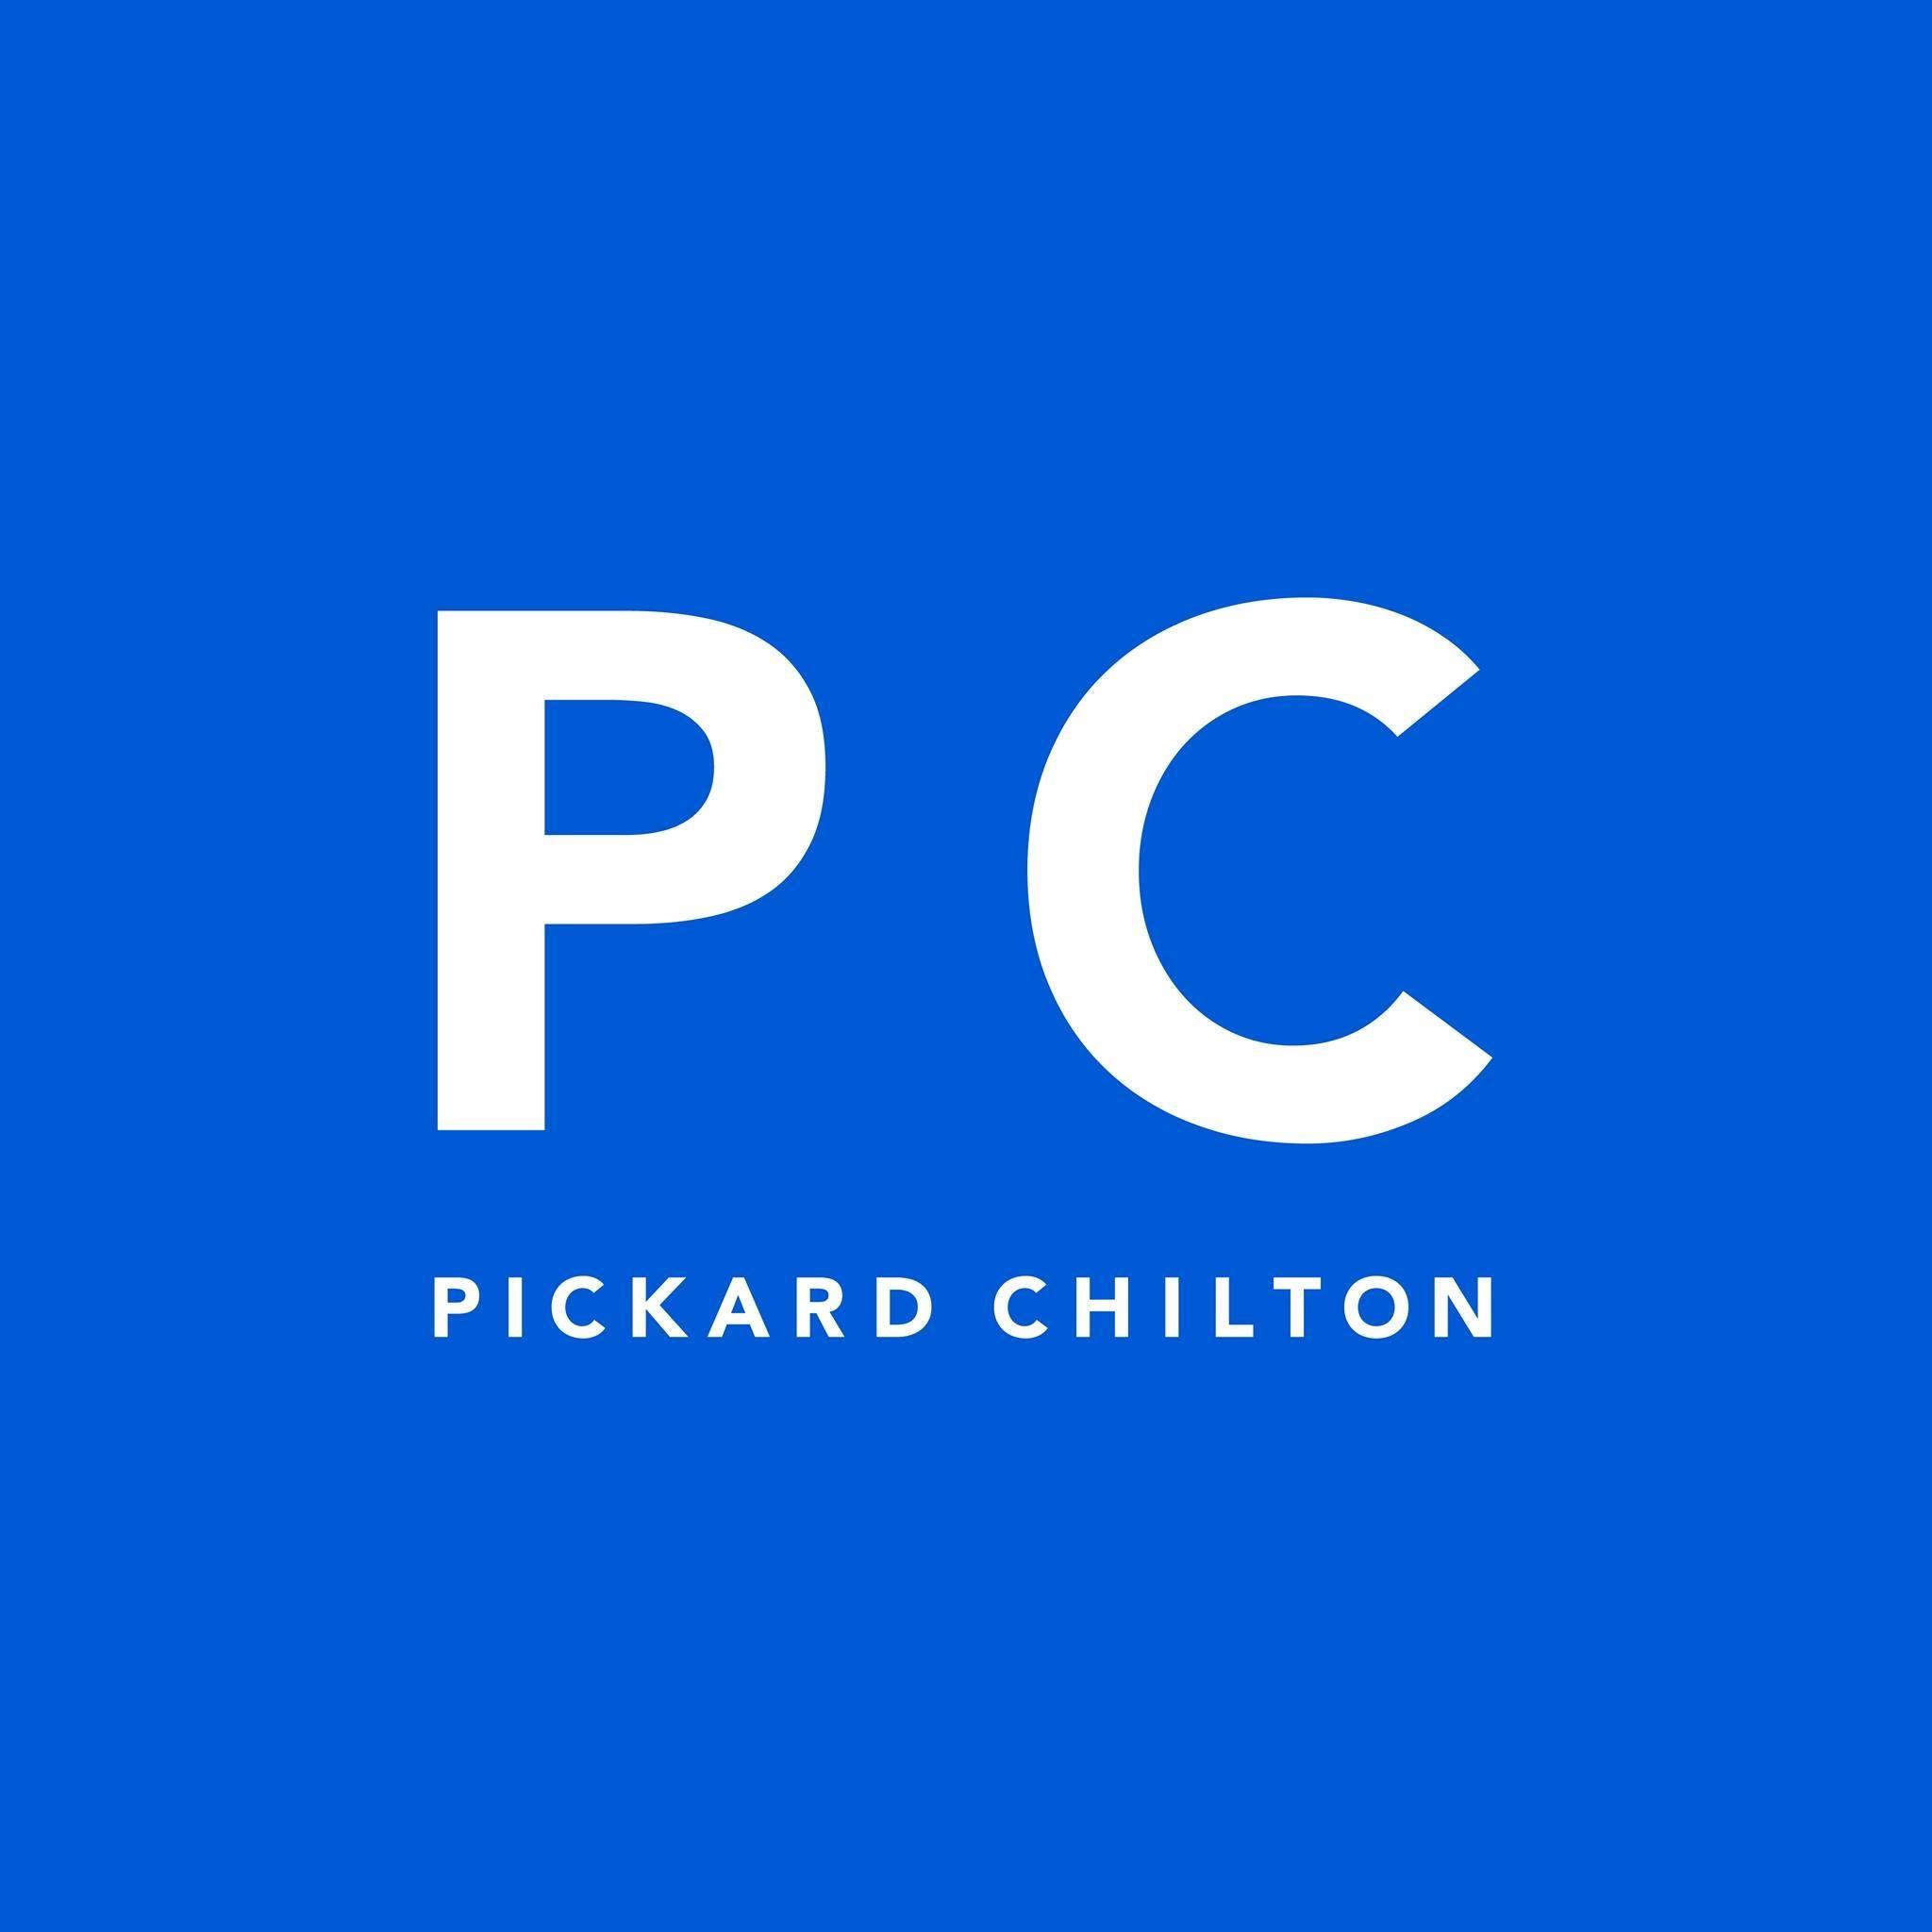 Pickard Chilton